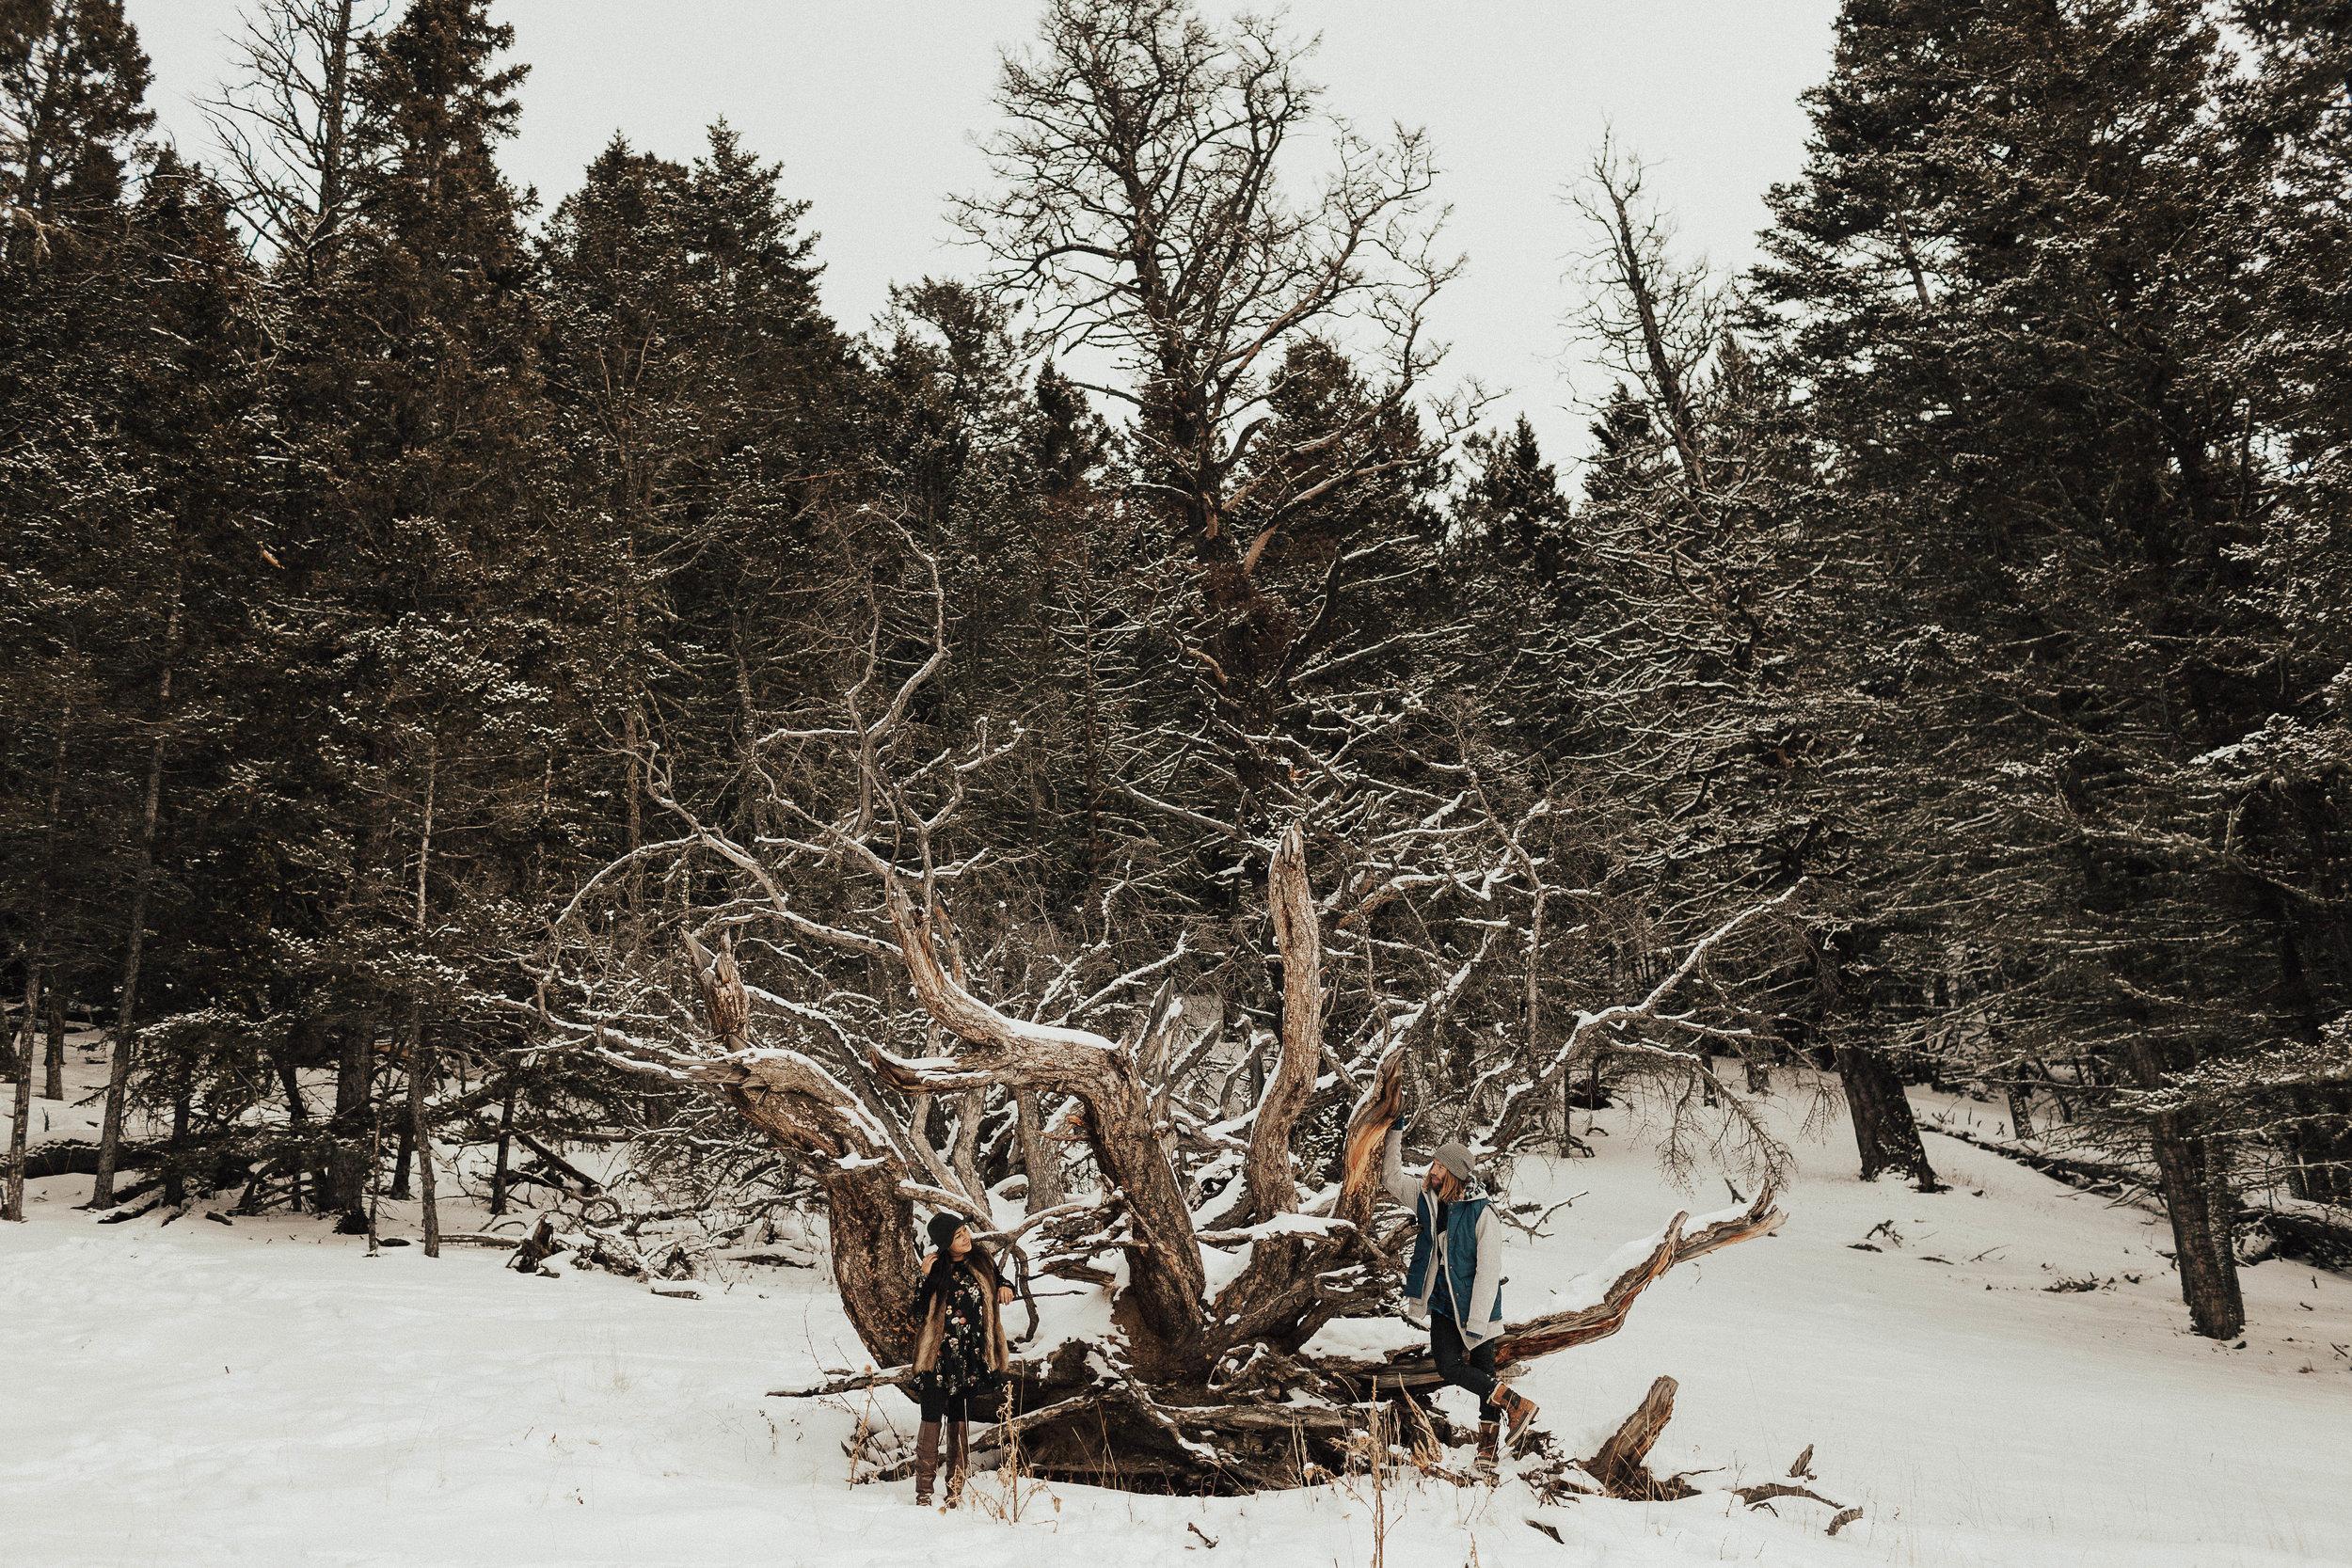 Banff Engagement Photographer - Winter Mountain Adventure Engagement Session - Michelle Larmand Photography-074